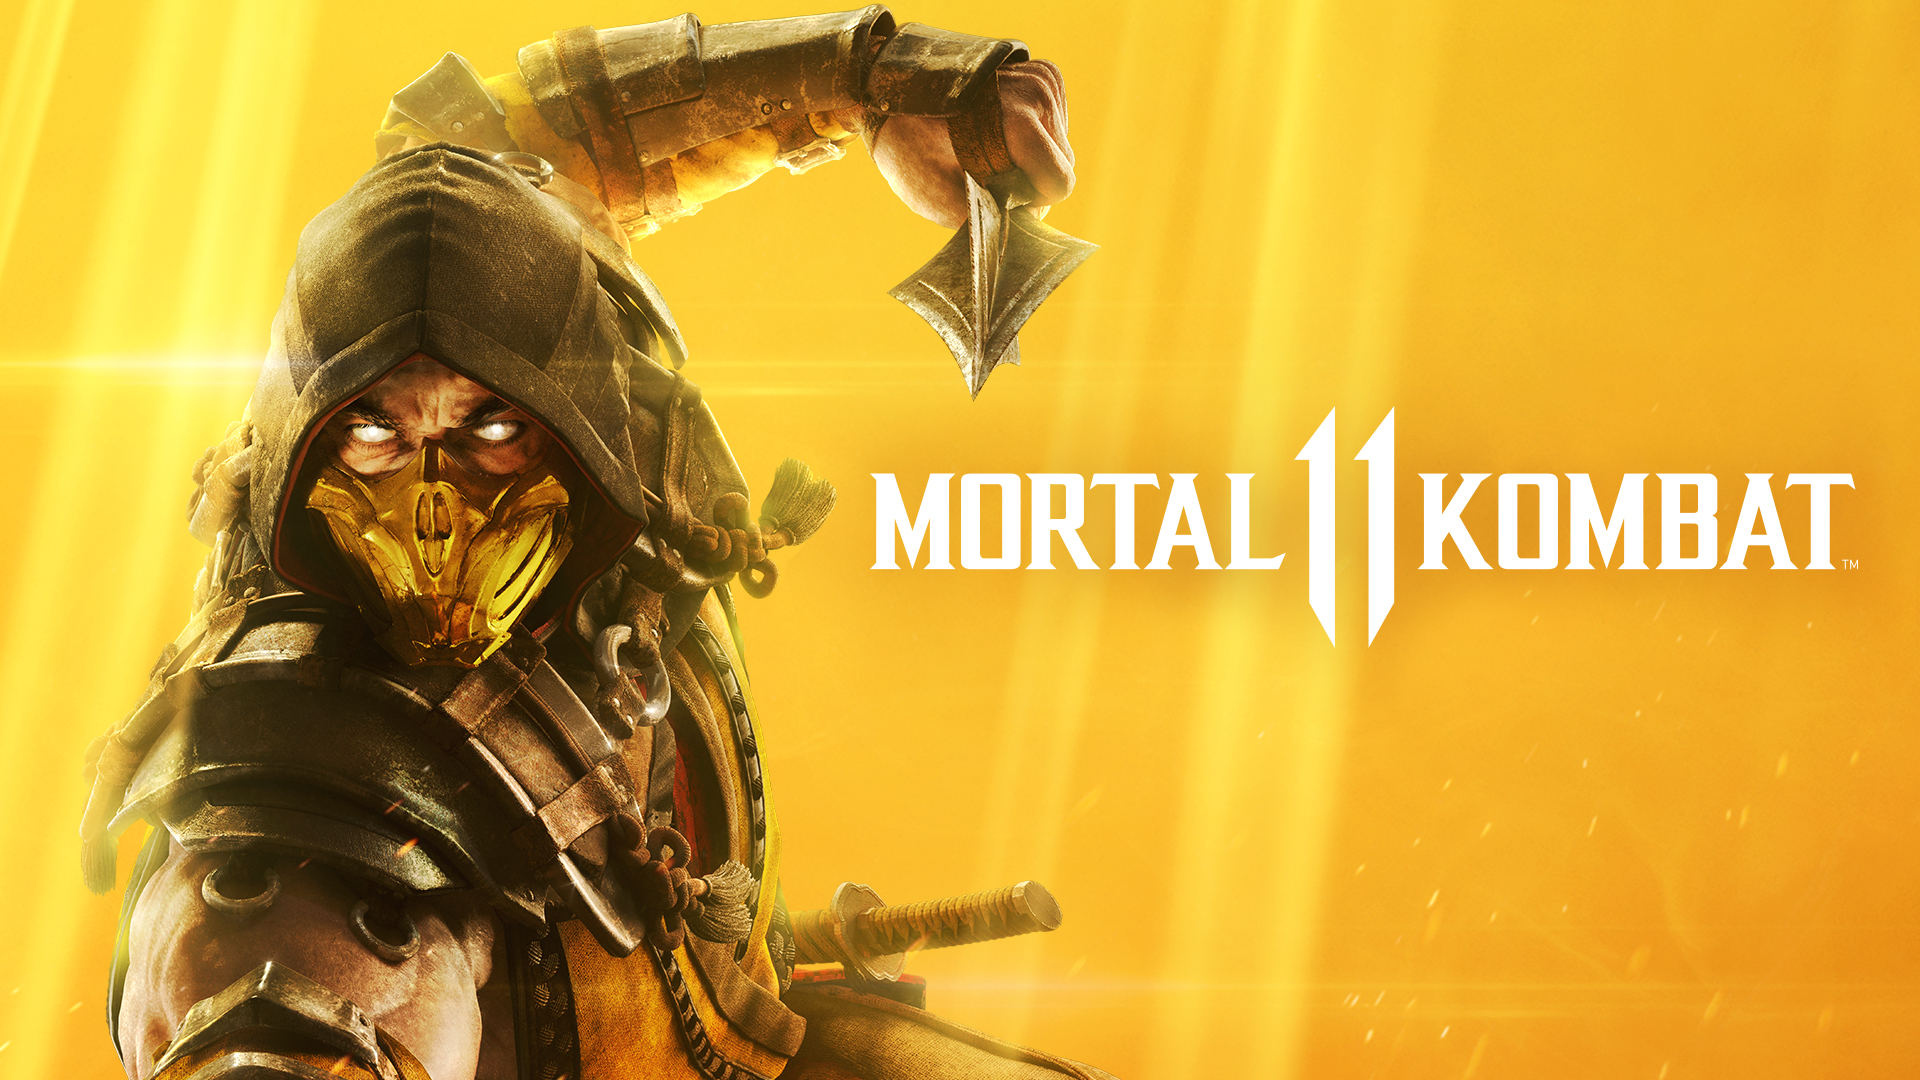 Mortal Kombat 11 sold over 12 million units worldwide